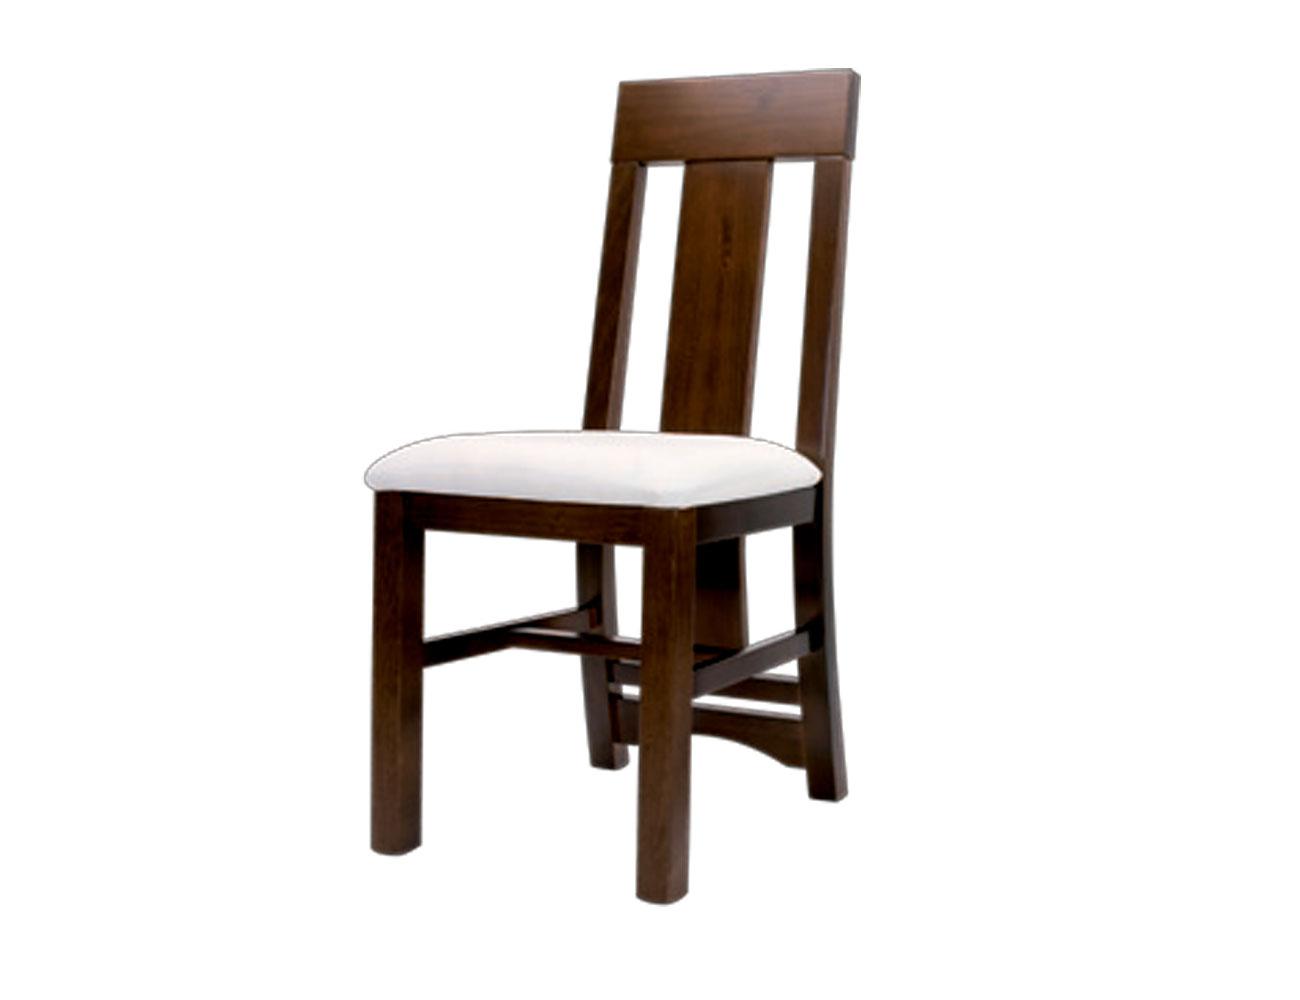 C0 51 silla madera tapizada2